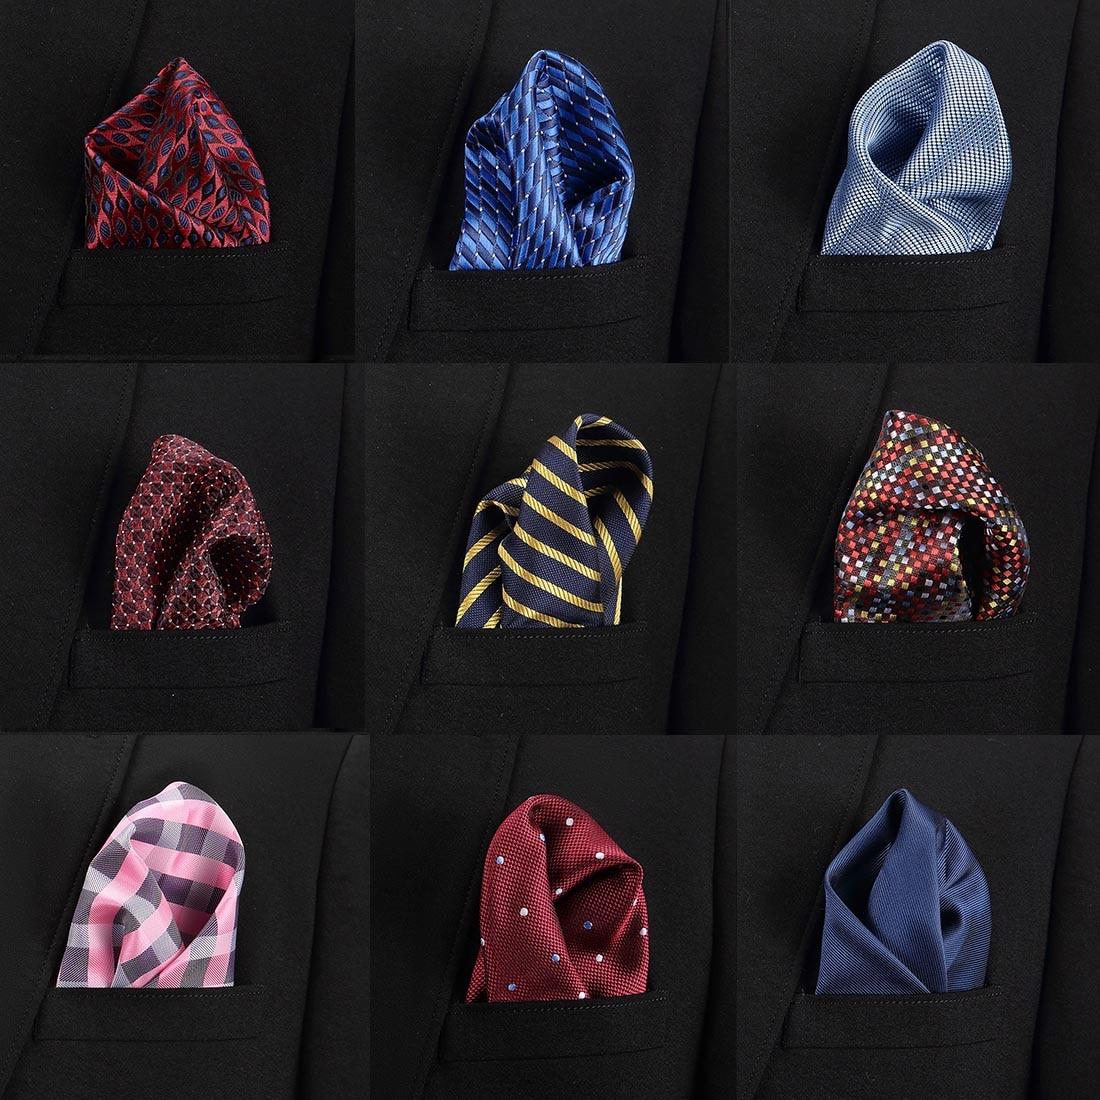 2020 New Mens Pocket Squares Paisley Pattern  Handkerchief Fashion Hanky For Men Business Suit Accessories Wedding 22cm*22cm